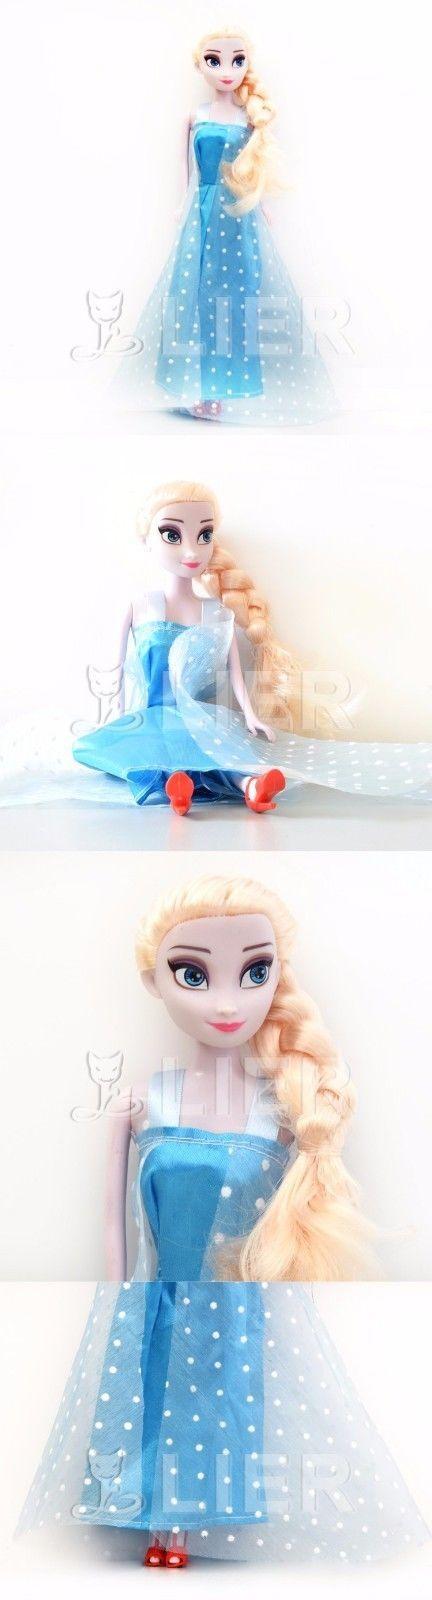 Princess Elsa Anna Doll Snow Queen Children Girls Toys Birthday Gifts